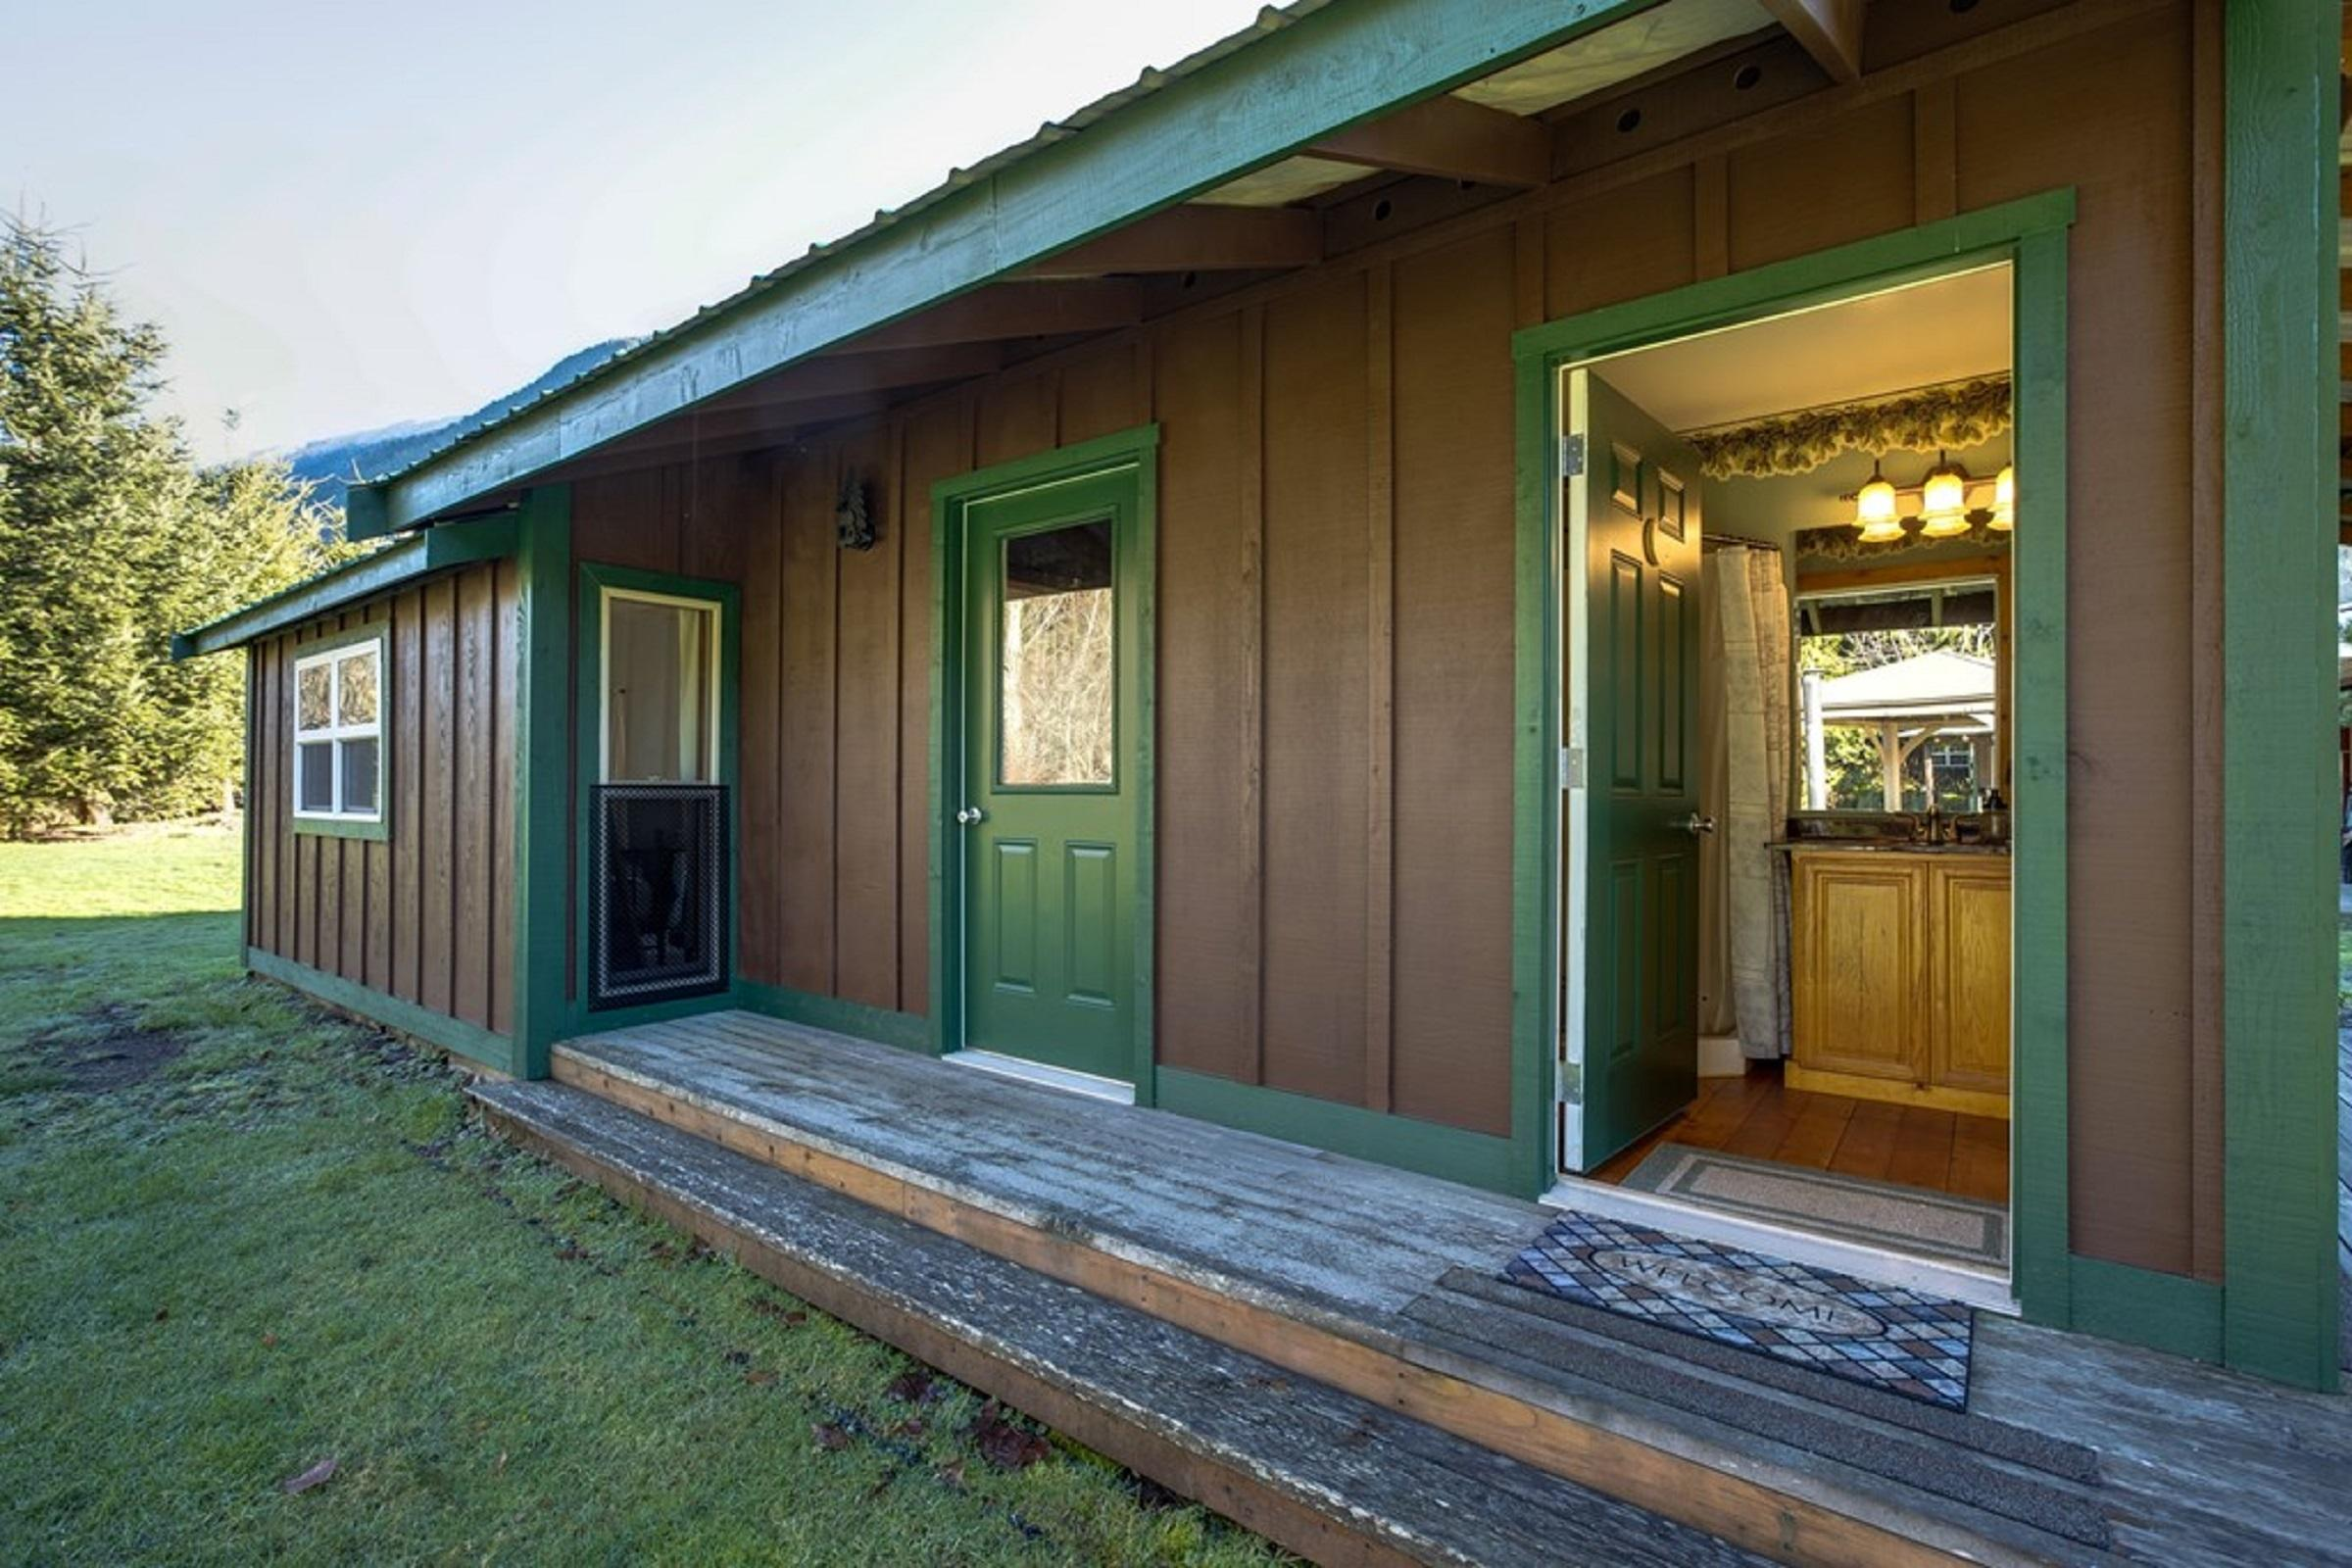 Apartment Mt  Baker Lodging Cabin  72  ndash  PET FRIENDY  MT VIEWS  BBQ  SLEEPS 2  photo 31818161